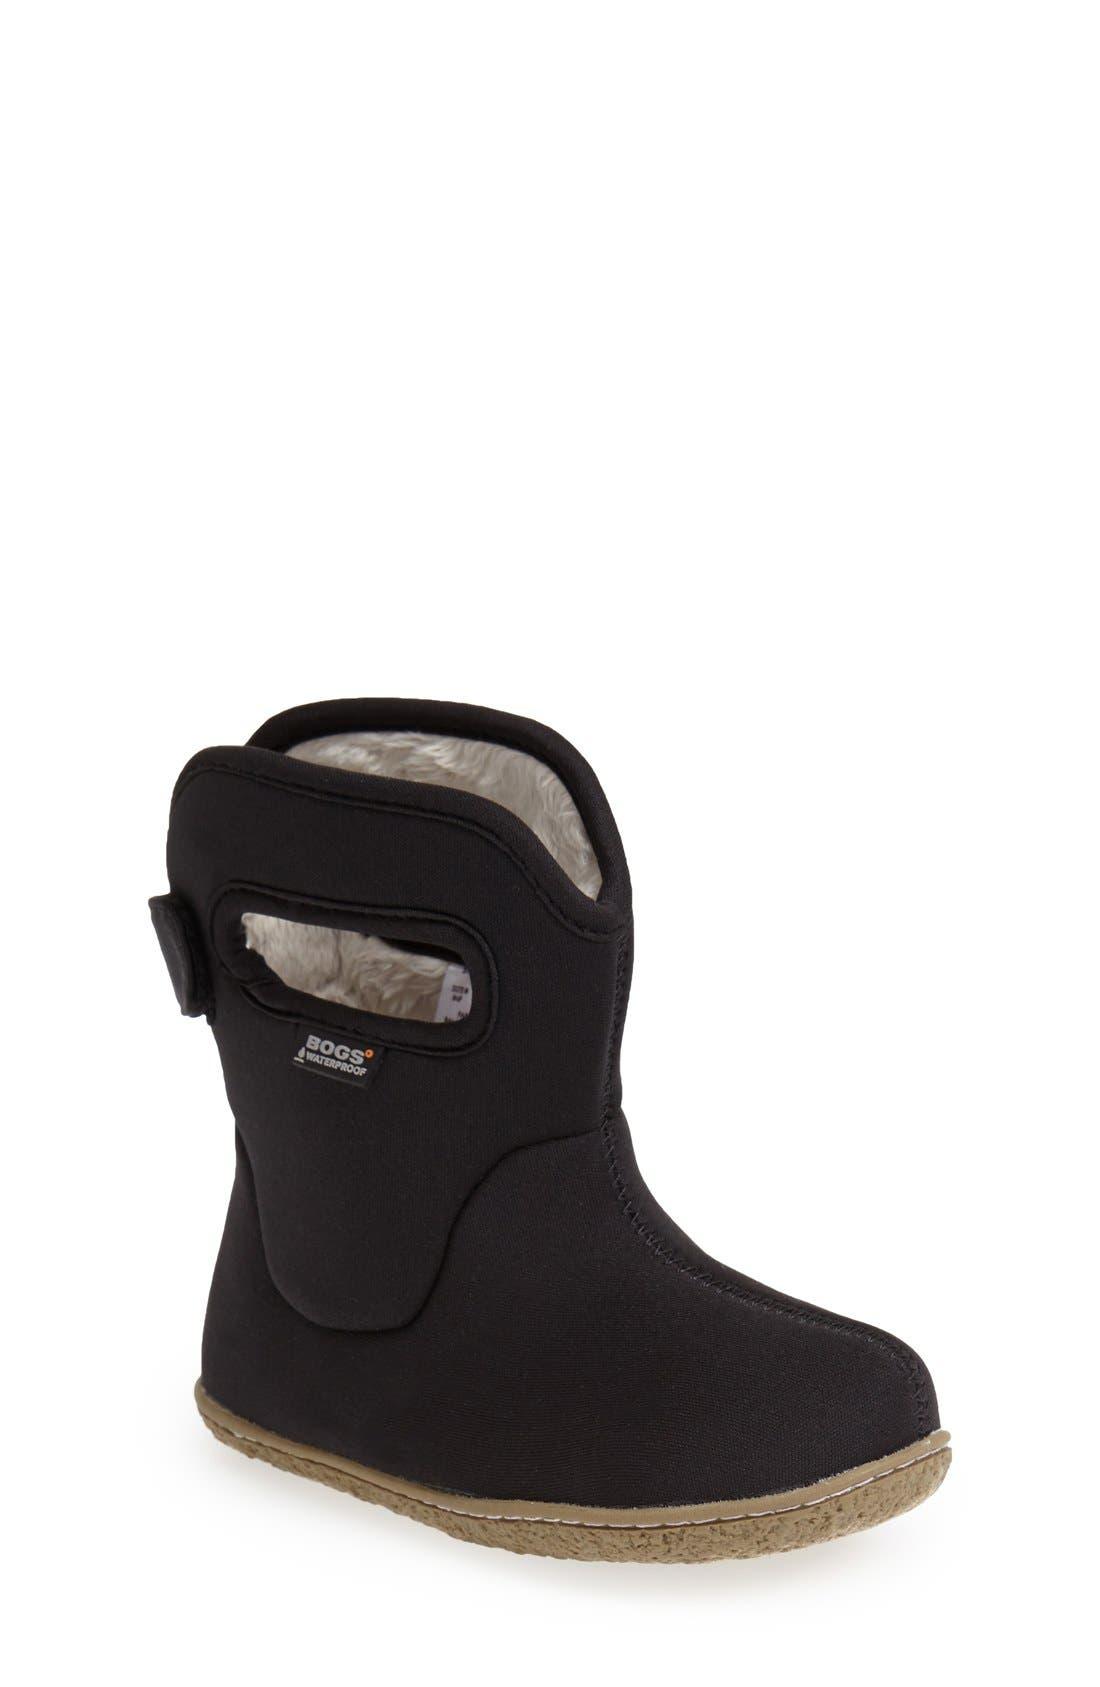 BOGS,                             Baby Bogs Insulated Waterproof Rain Boot,                             Main thumbnail 1, color,                             BLACK